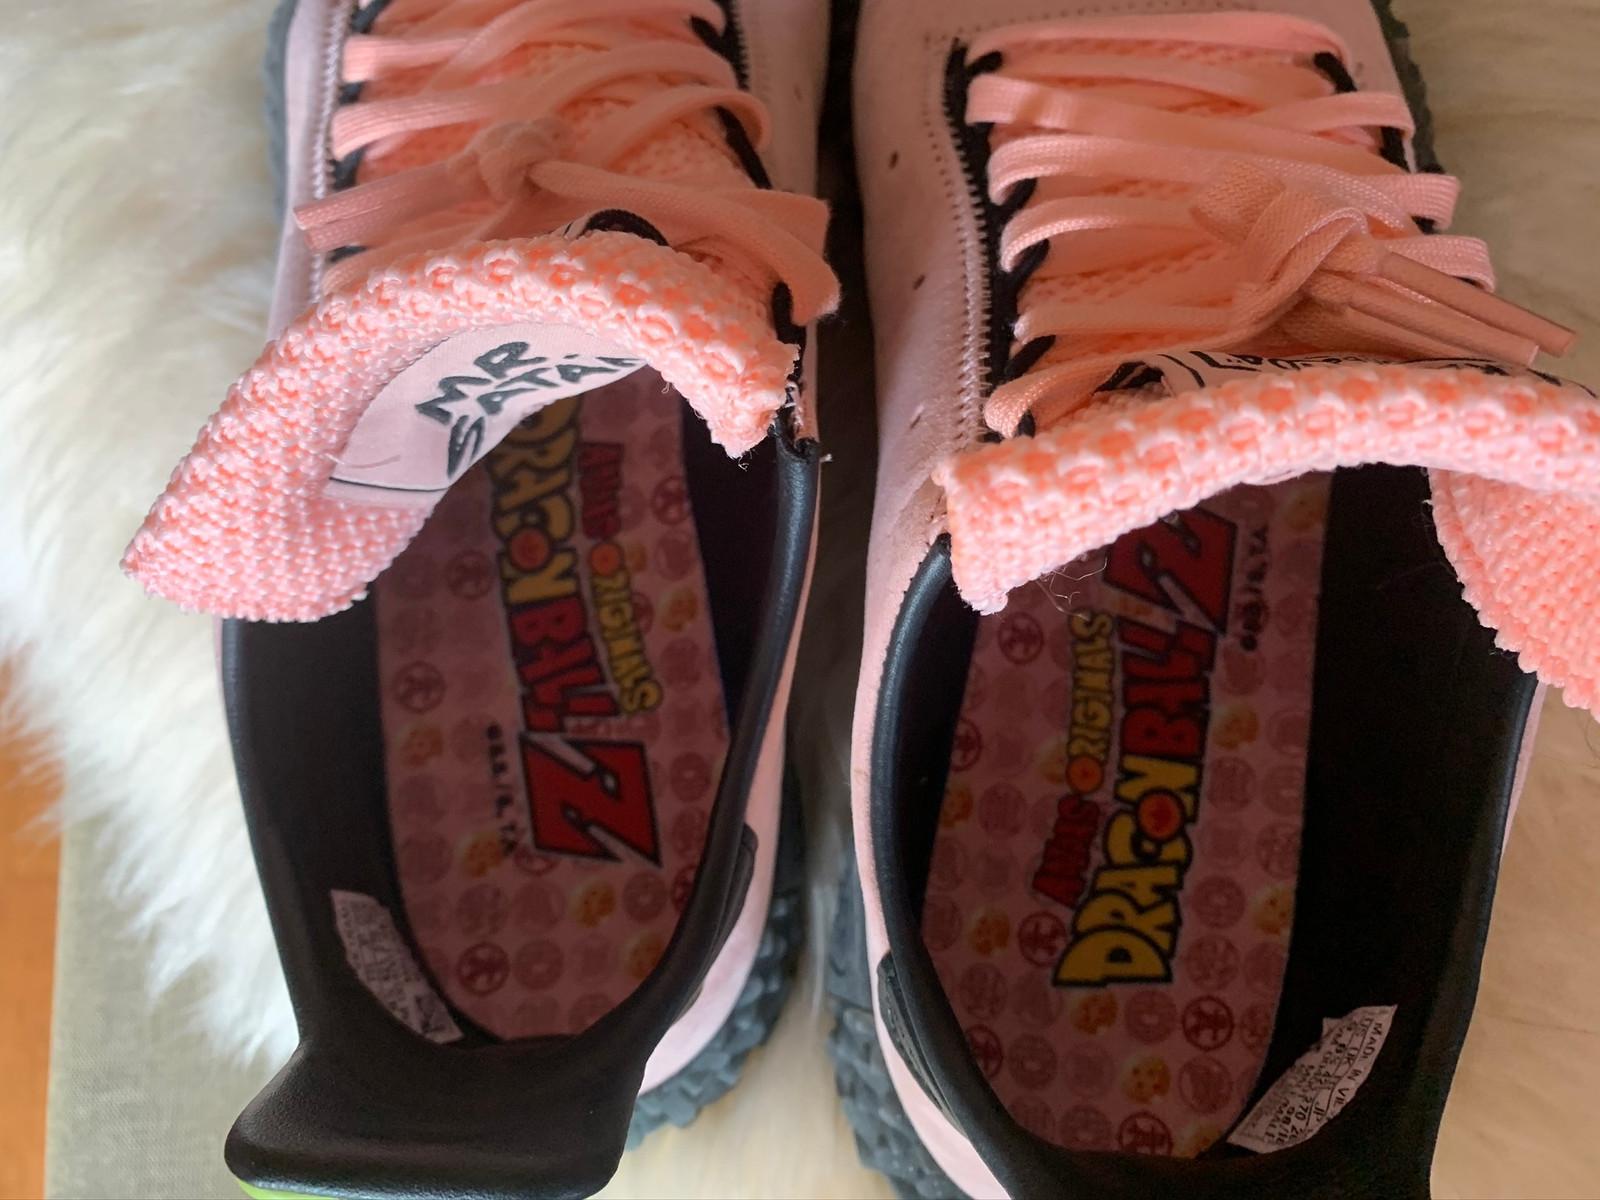 Dragon Ball Z x adidas Kamanda Majin Buu Release Date